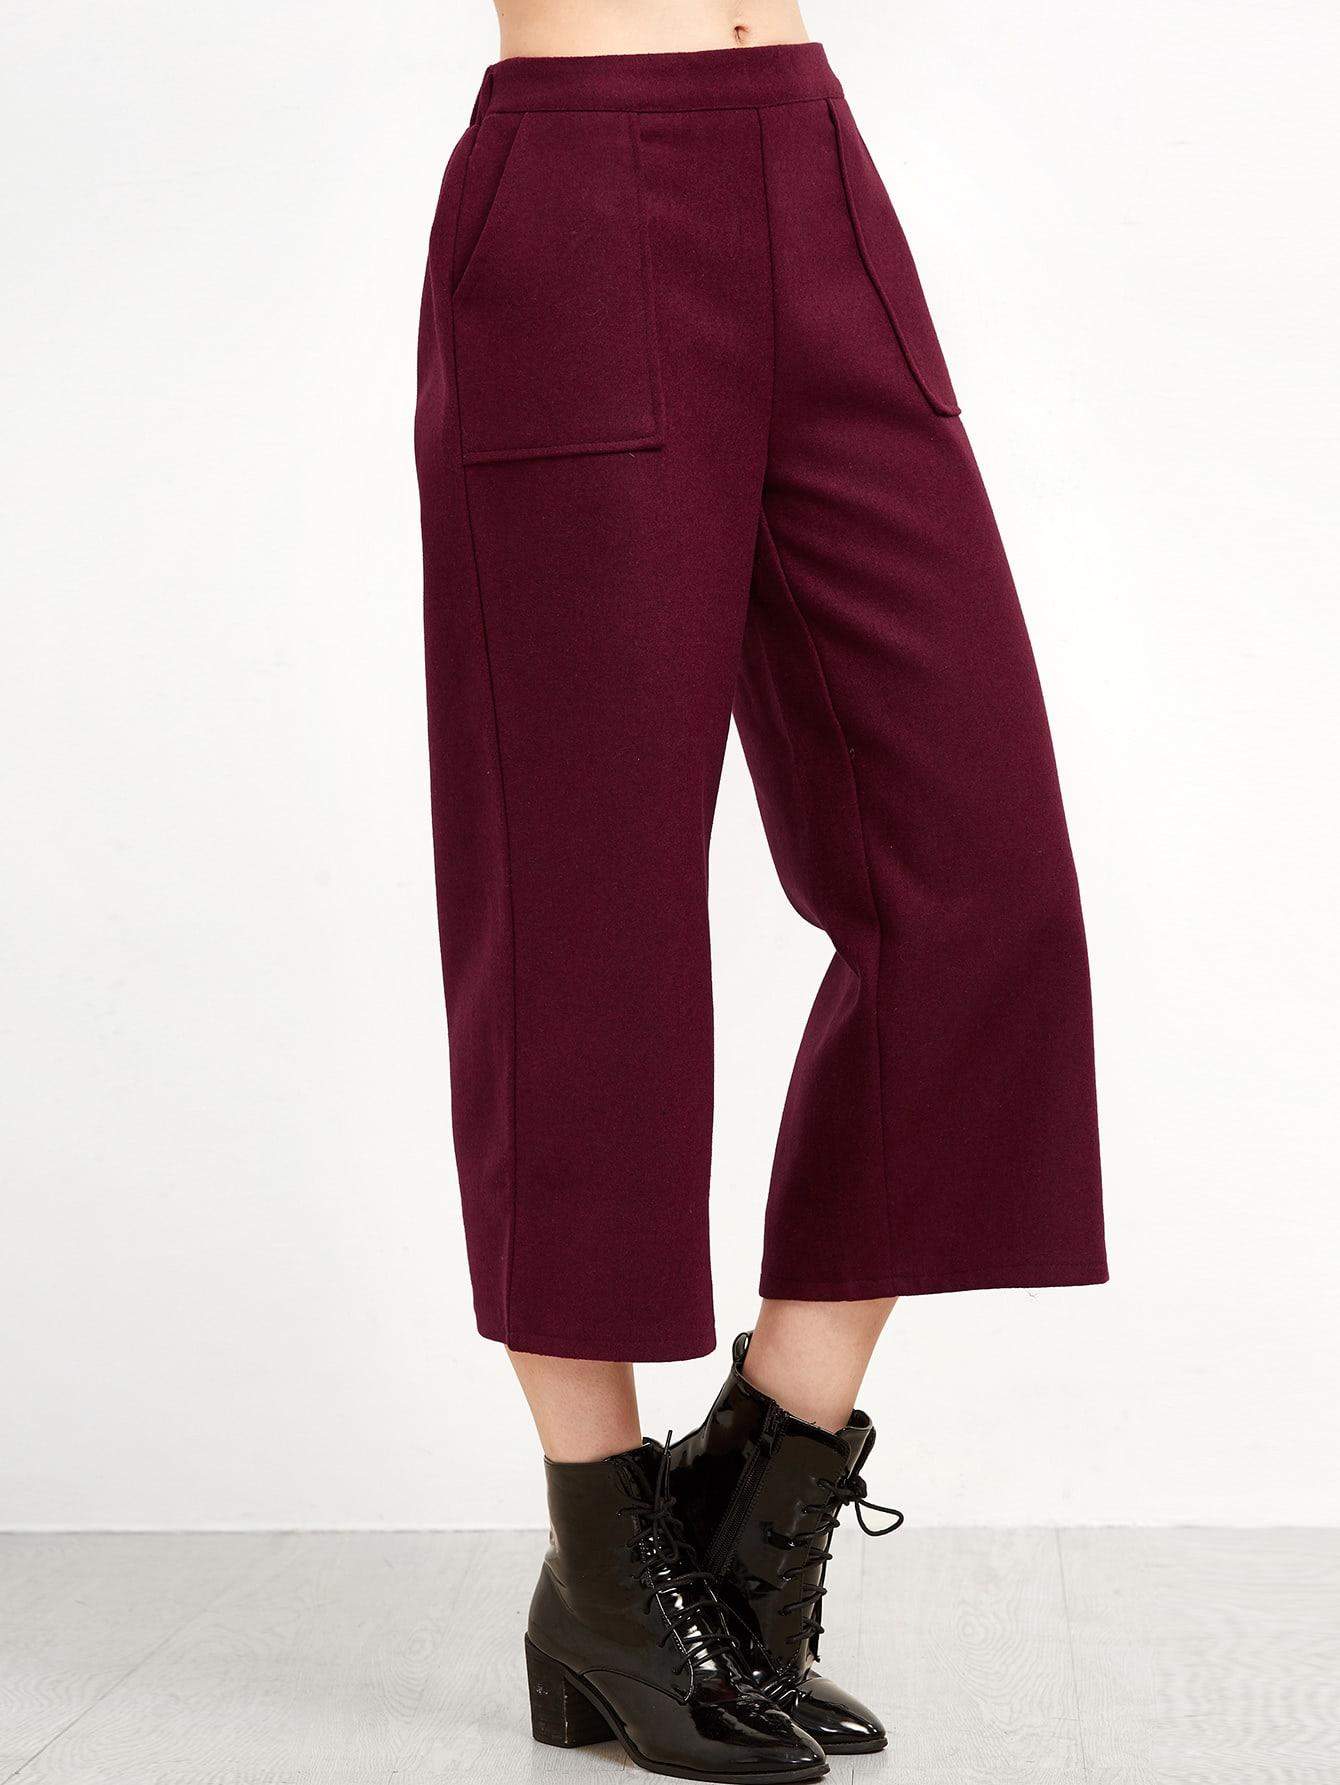 Wide Leg Dual Pockets Pants pants161004101